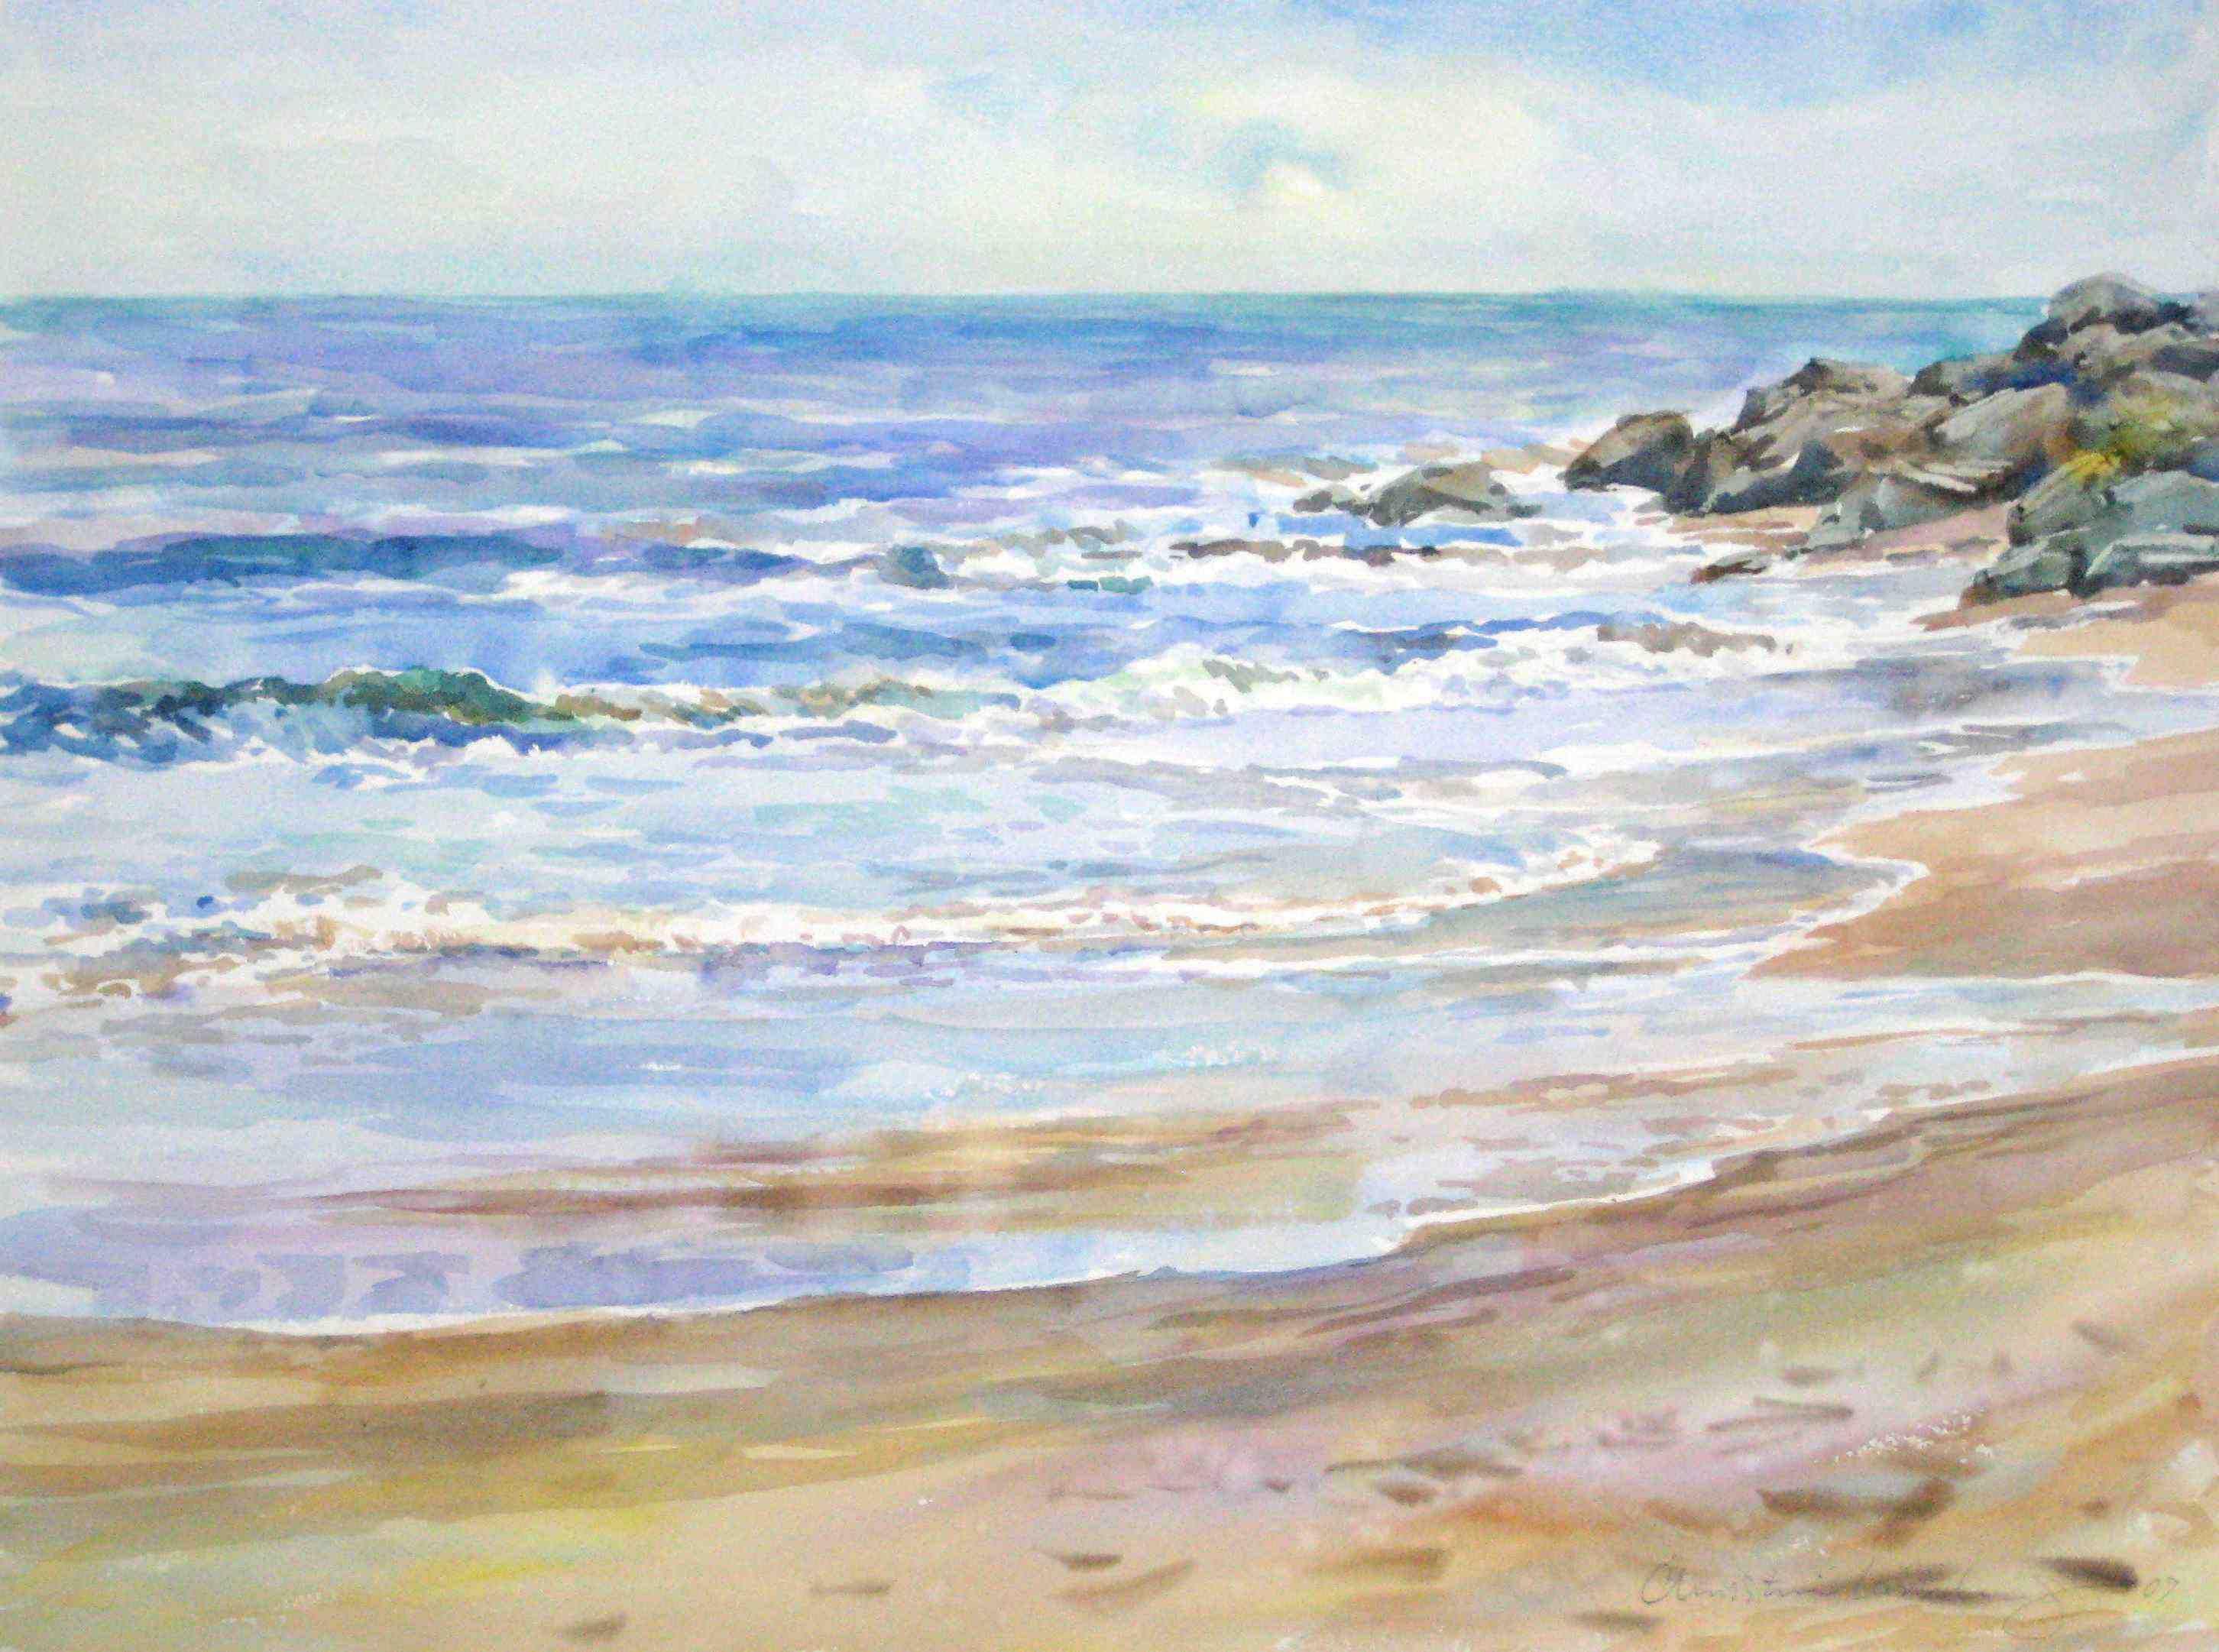 Pin By Sharon Findlay On Art Watercolor Ocean Beach Watercolor Watercolor Landscape